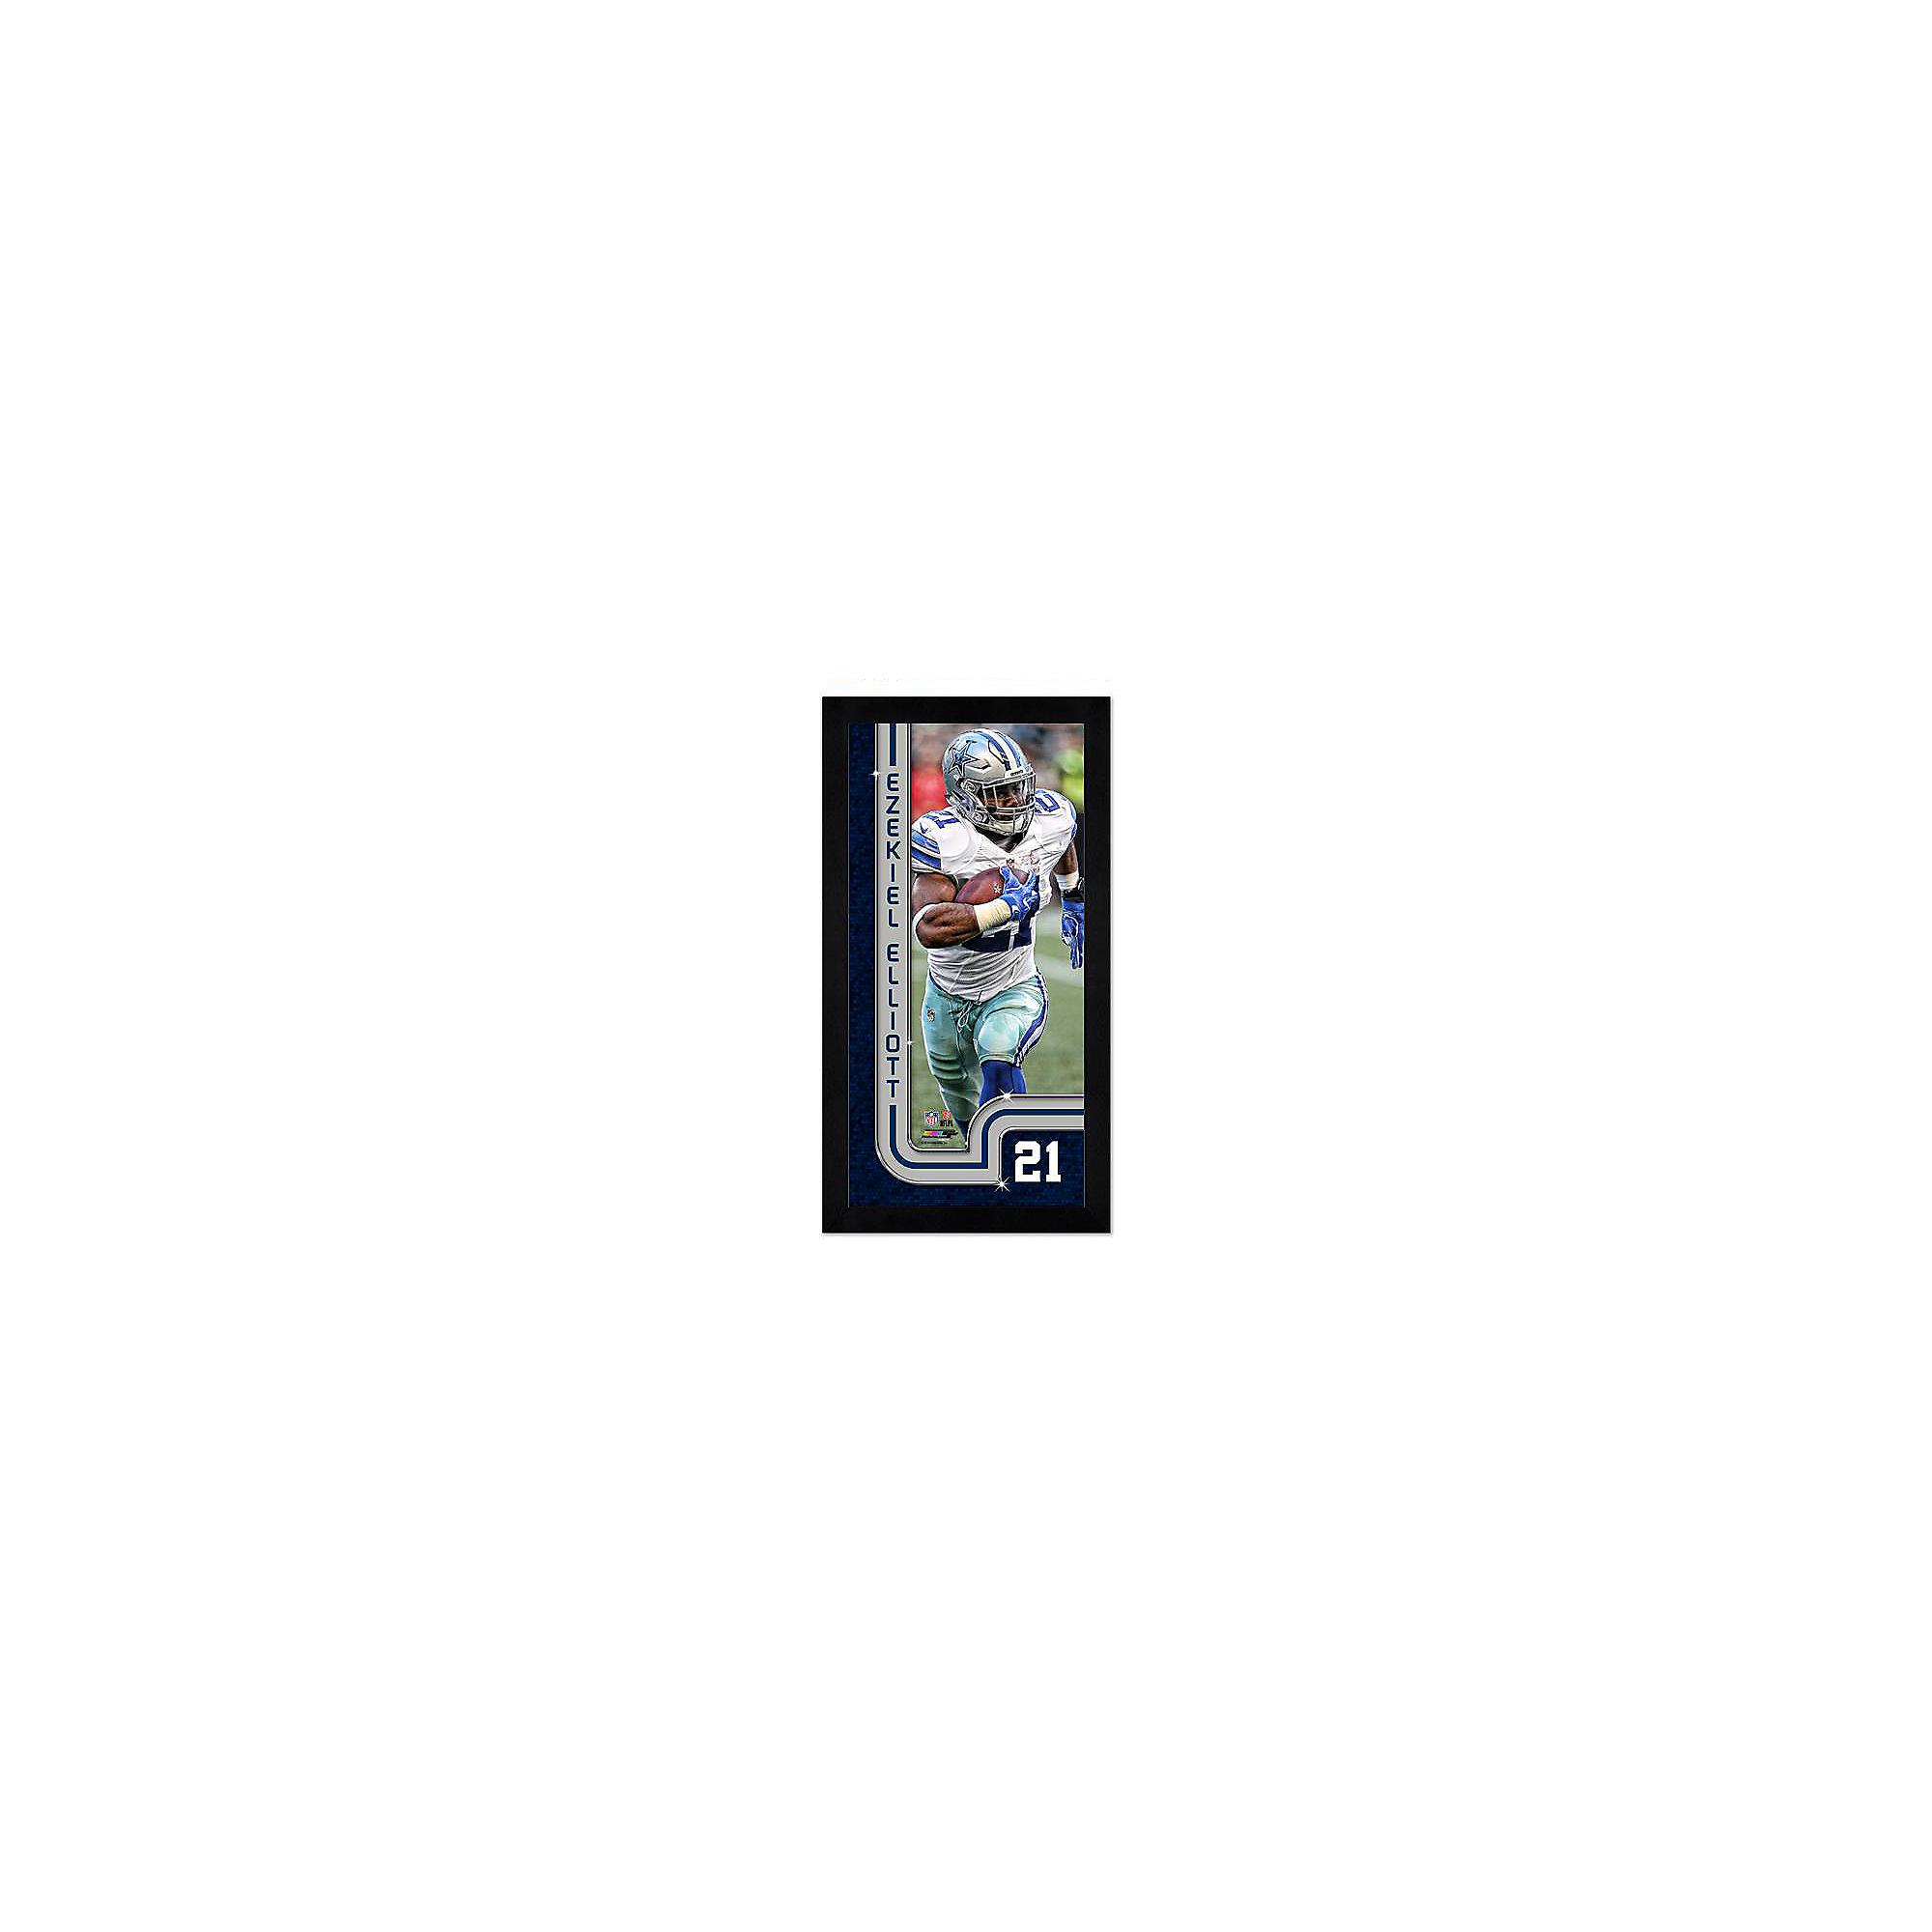 209b5f80d25 Dallas Cowboys Ezekiel Elliott Mini Frame | Dallas Cowboys Pro Shop